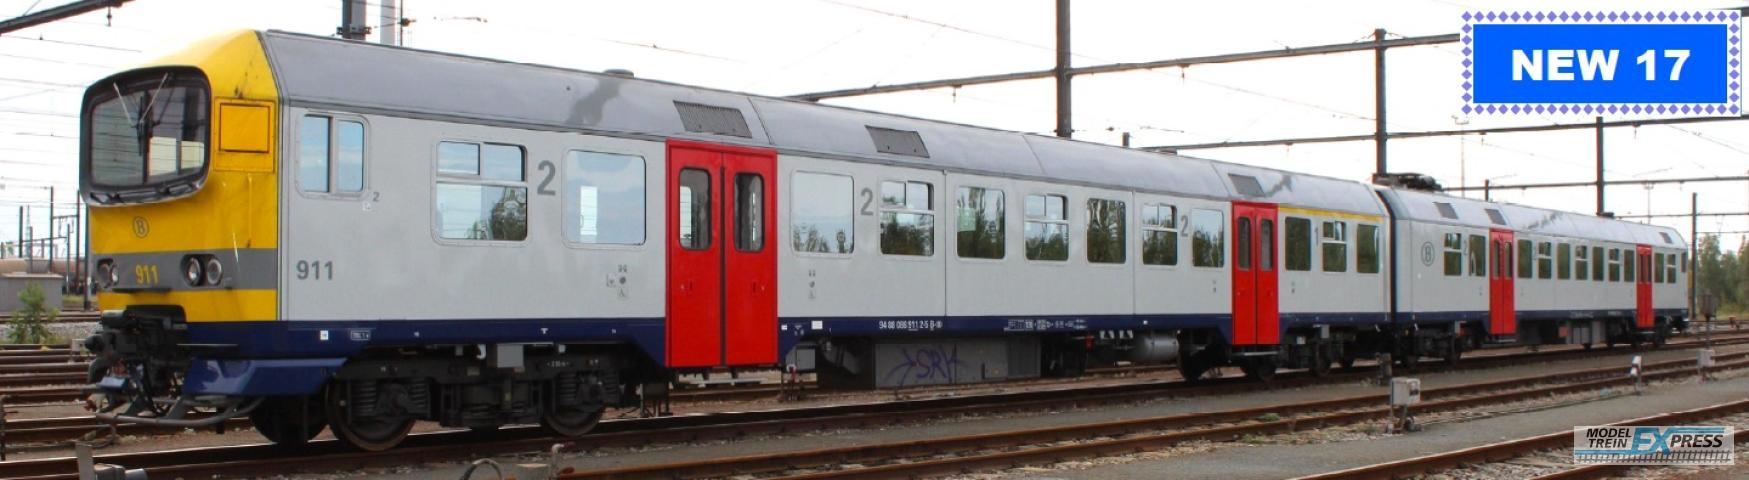 B-Models 4004.02L